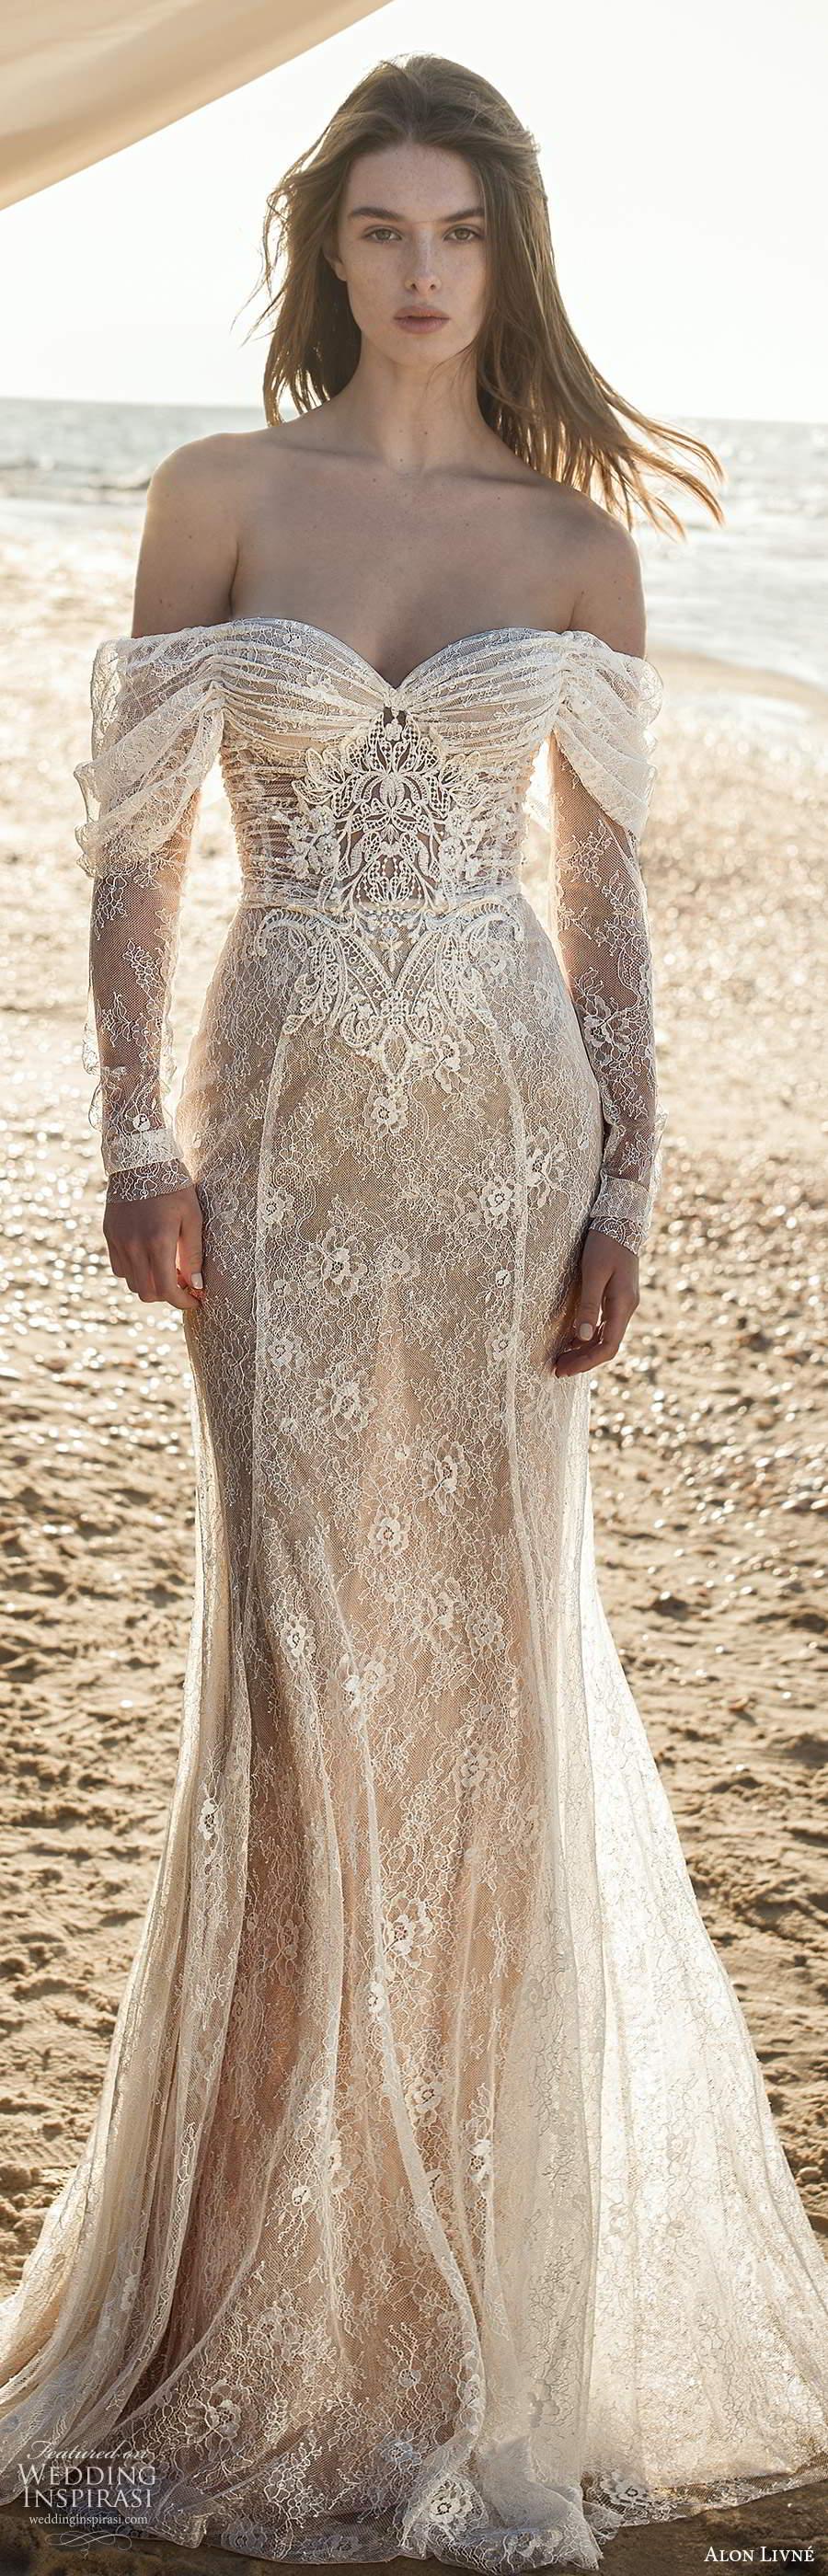 alon livne fall 2020 bridal illusion long sleeves off shoulder sweetheart neckline sheer bodice embellished lace fit flare mermaid wedding dress (3) lv